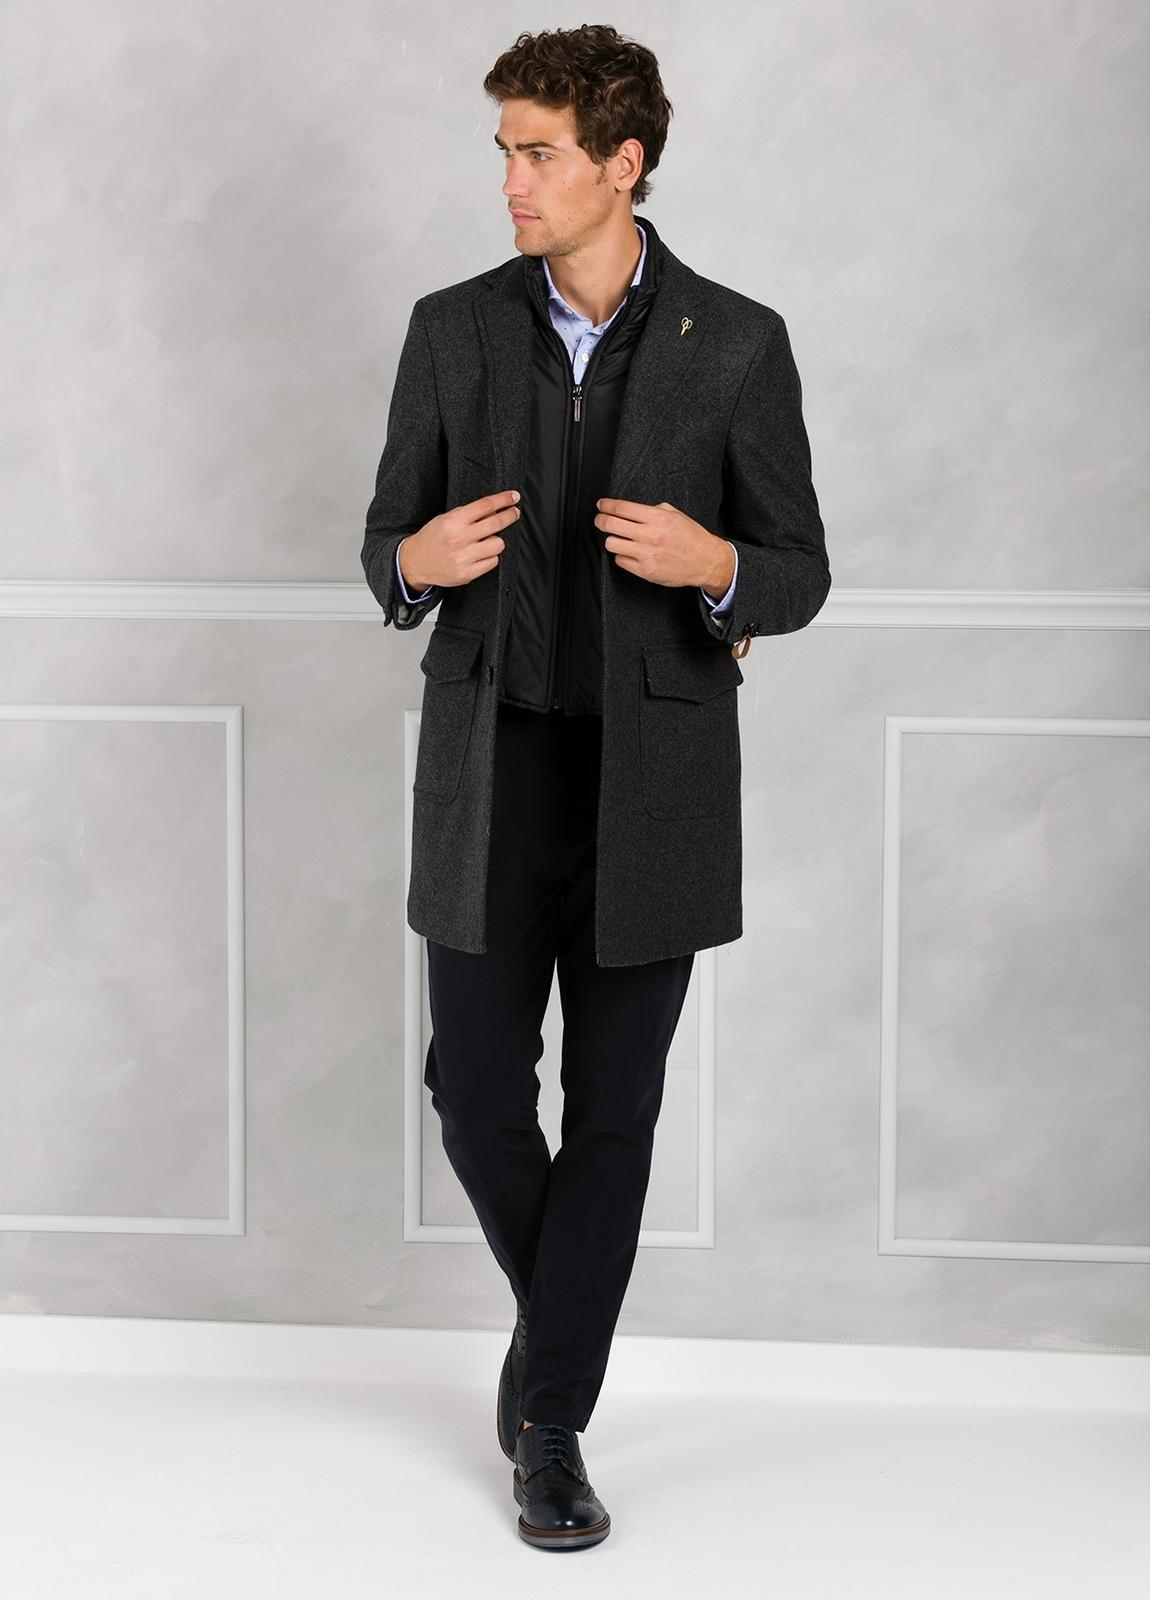 Abrigo tres botones color gris con pecherín interior. 65% Lana 30% Poliamida 5% fibras. - Ítem4